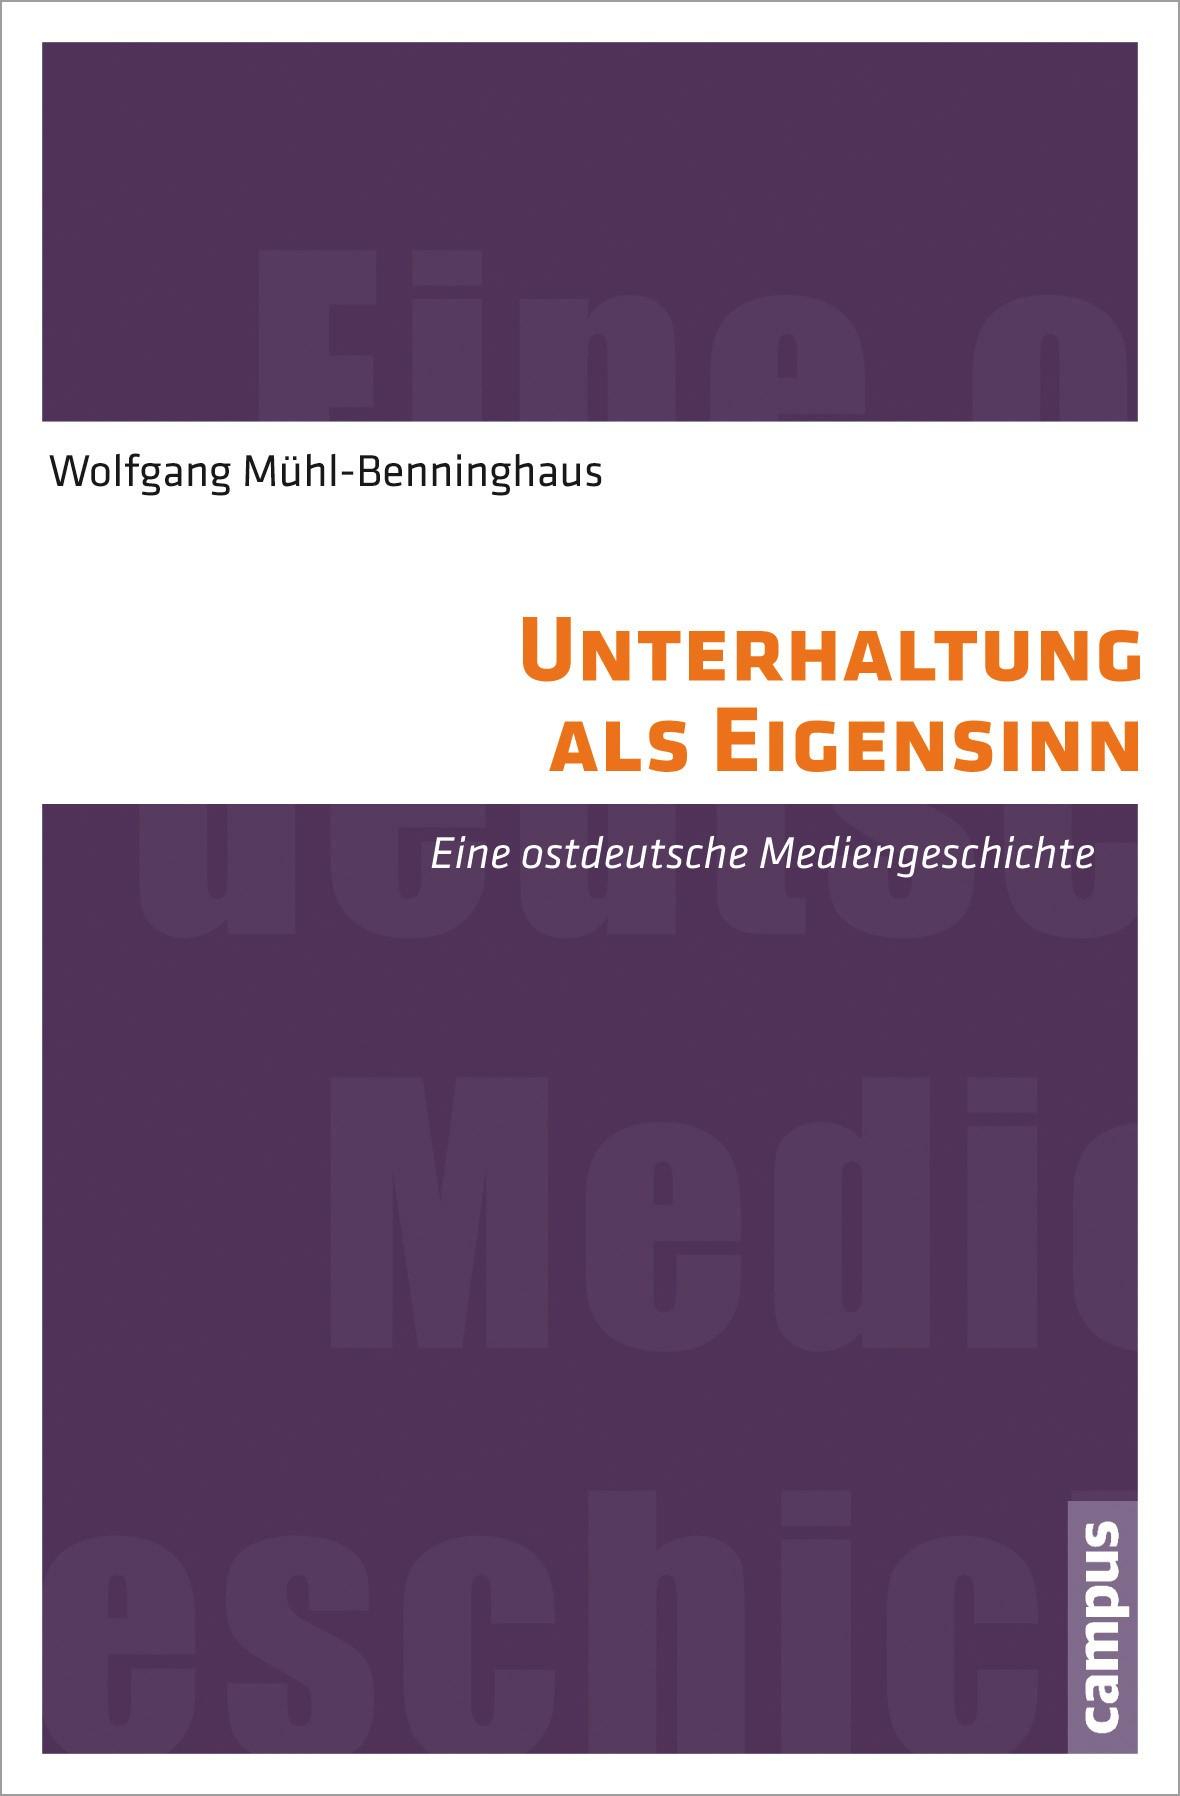 Unterhaltung als Eigensinn | Mühl-Benninghaus, 2012 | Buch (Cover)